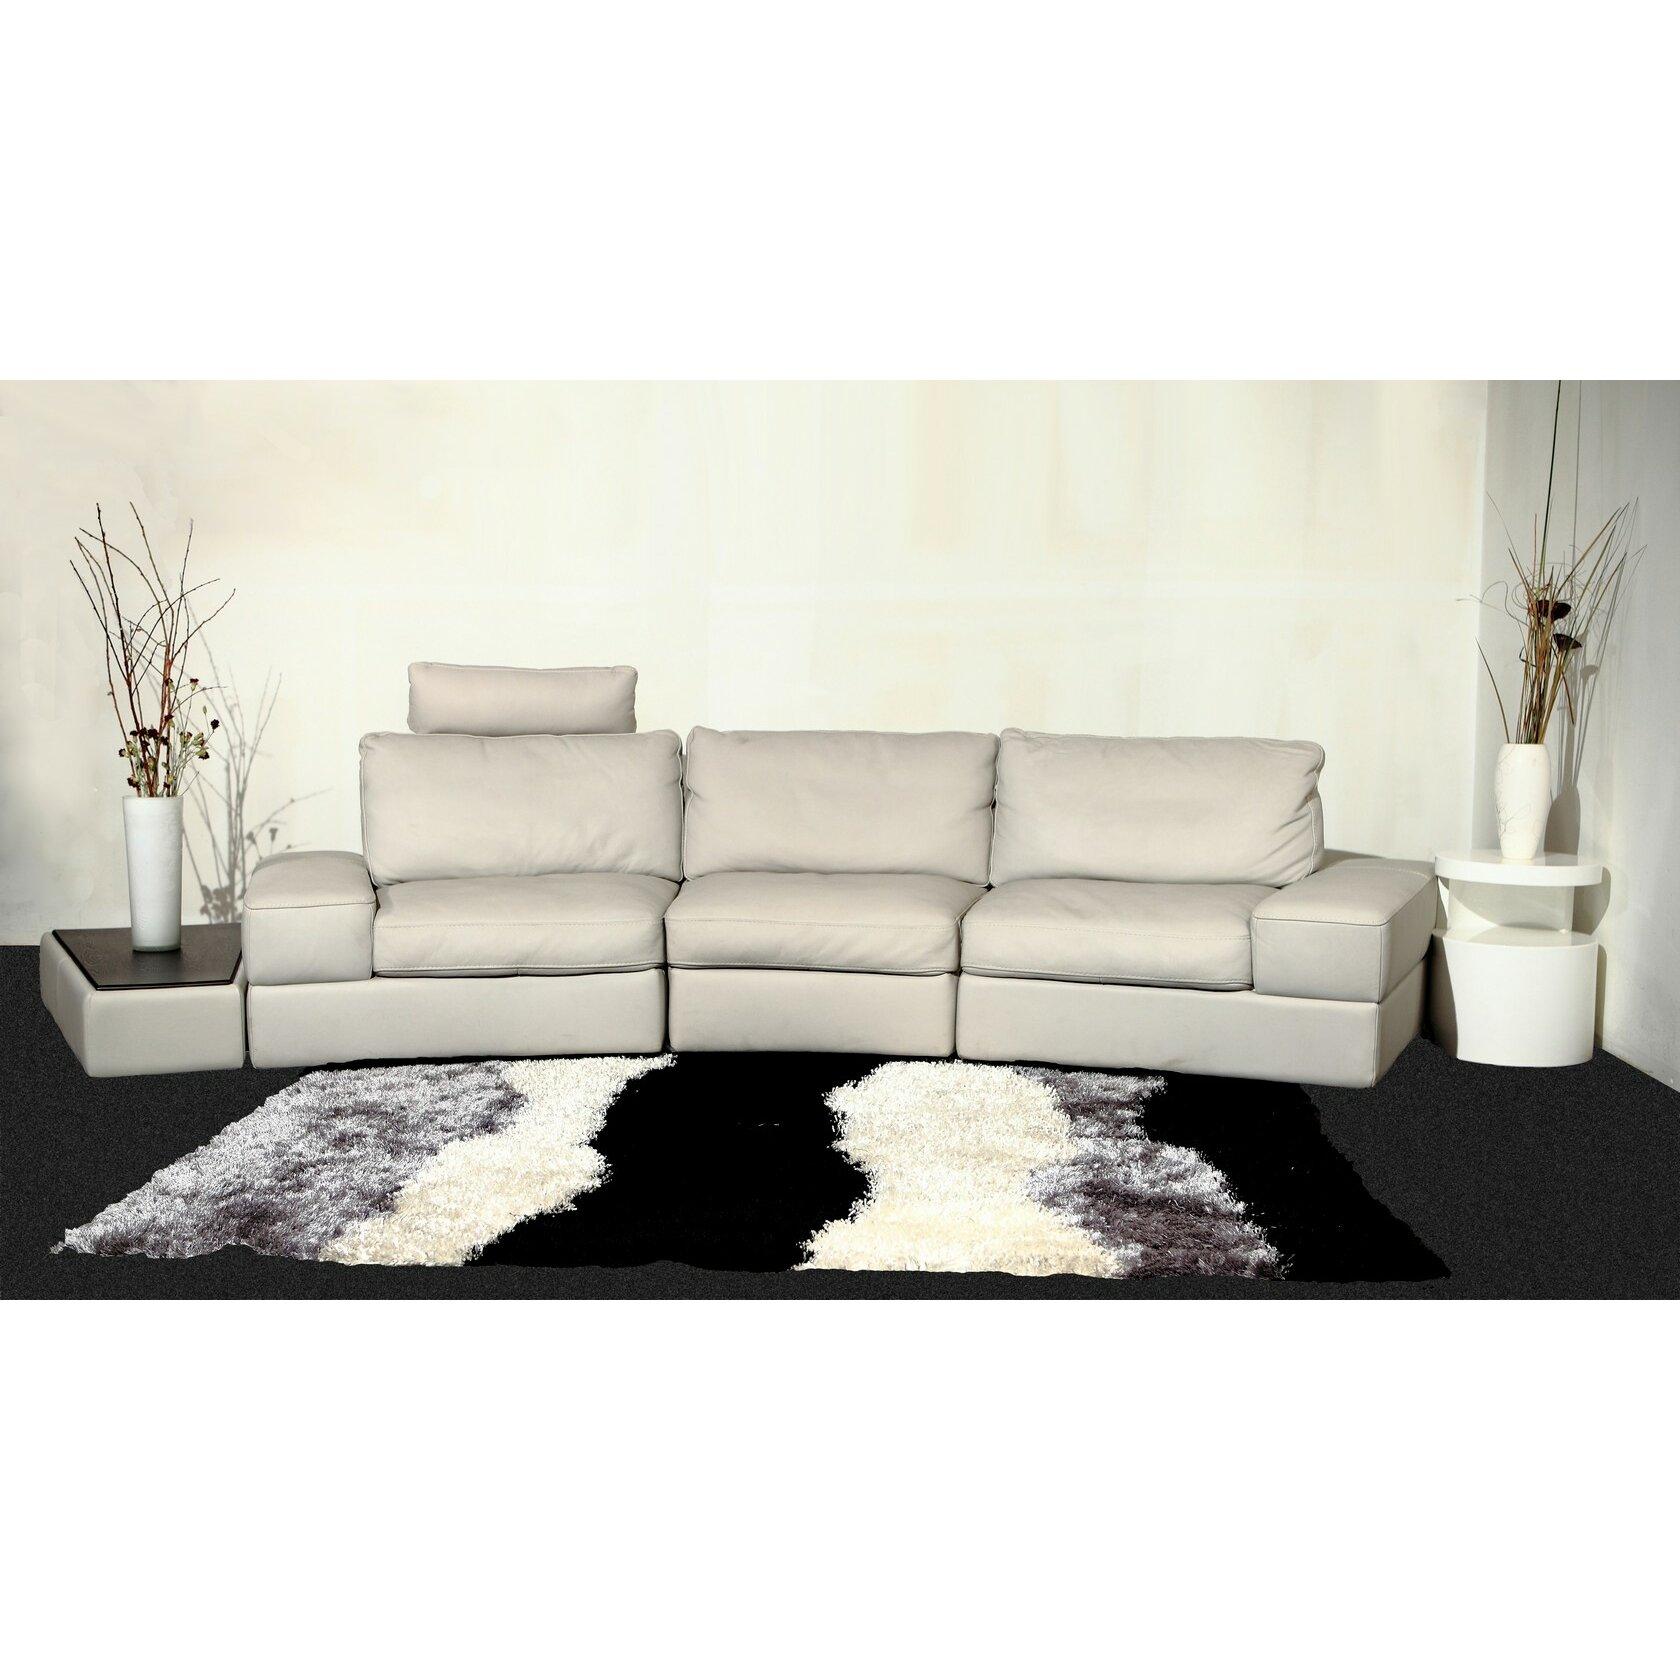 Hokku Designs Modi Leather Modular Sofa Reviews Wayfair